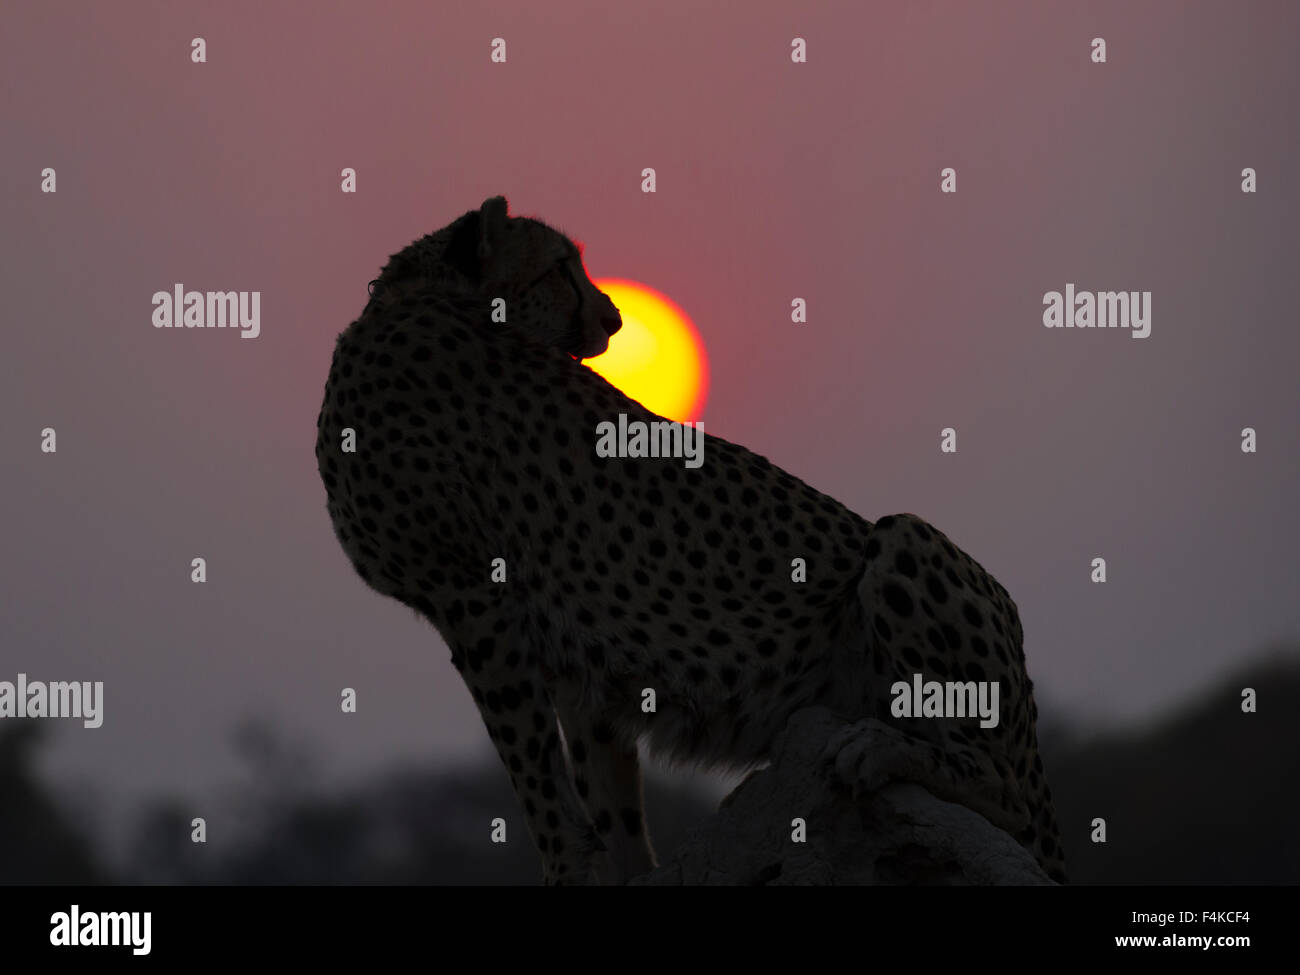 Female cheetah (Acinonyx jubatus) sitting against the setting sun, Sandibe Camp, Okavango Delta, Botswana, southern - Stock Image